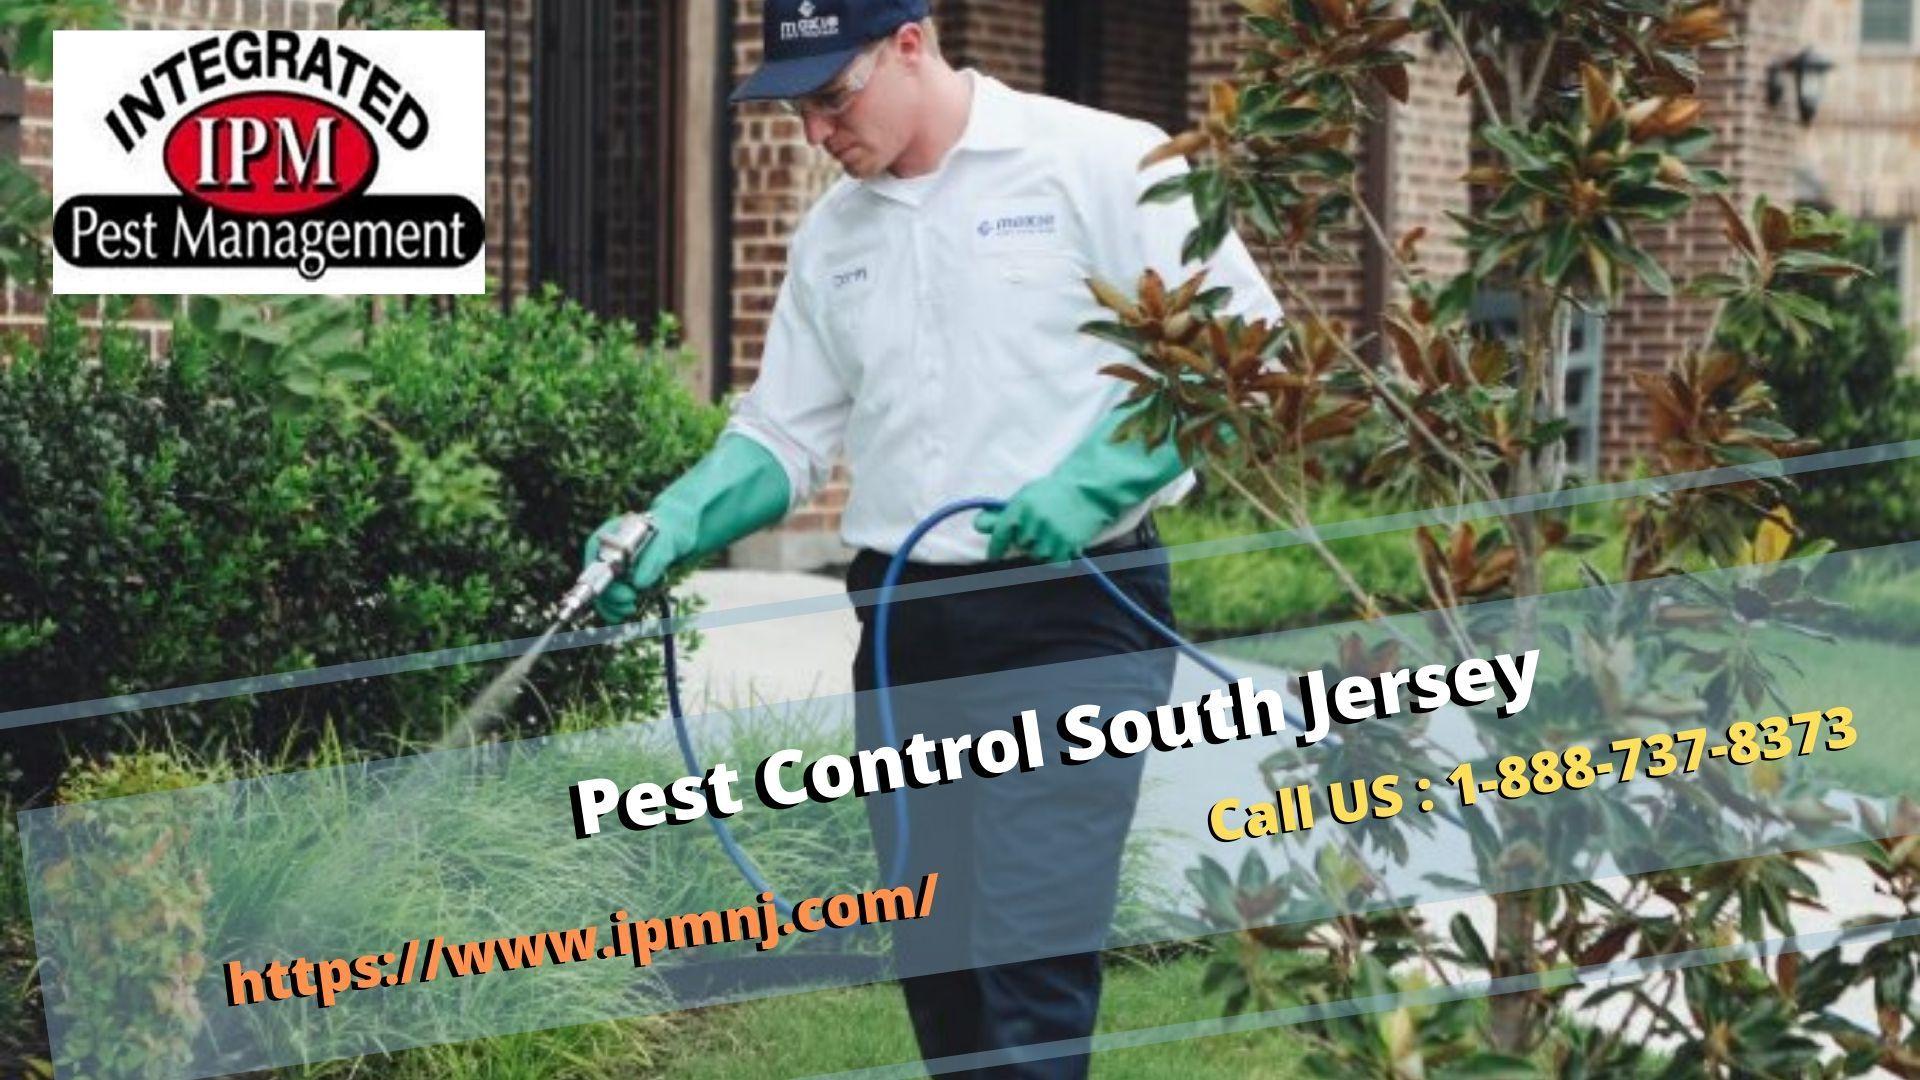 Pest Control South Jersey — imgbb.com